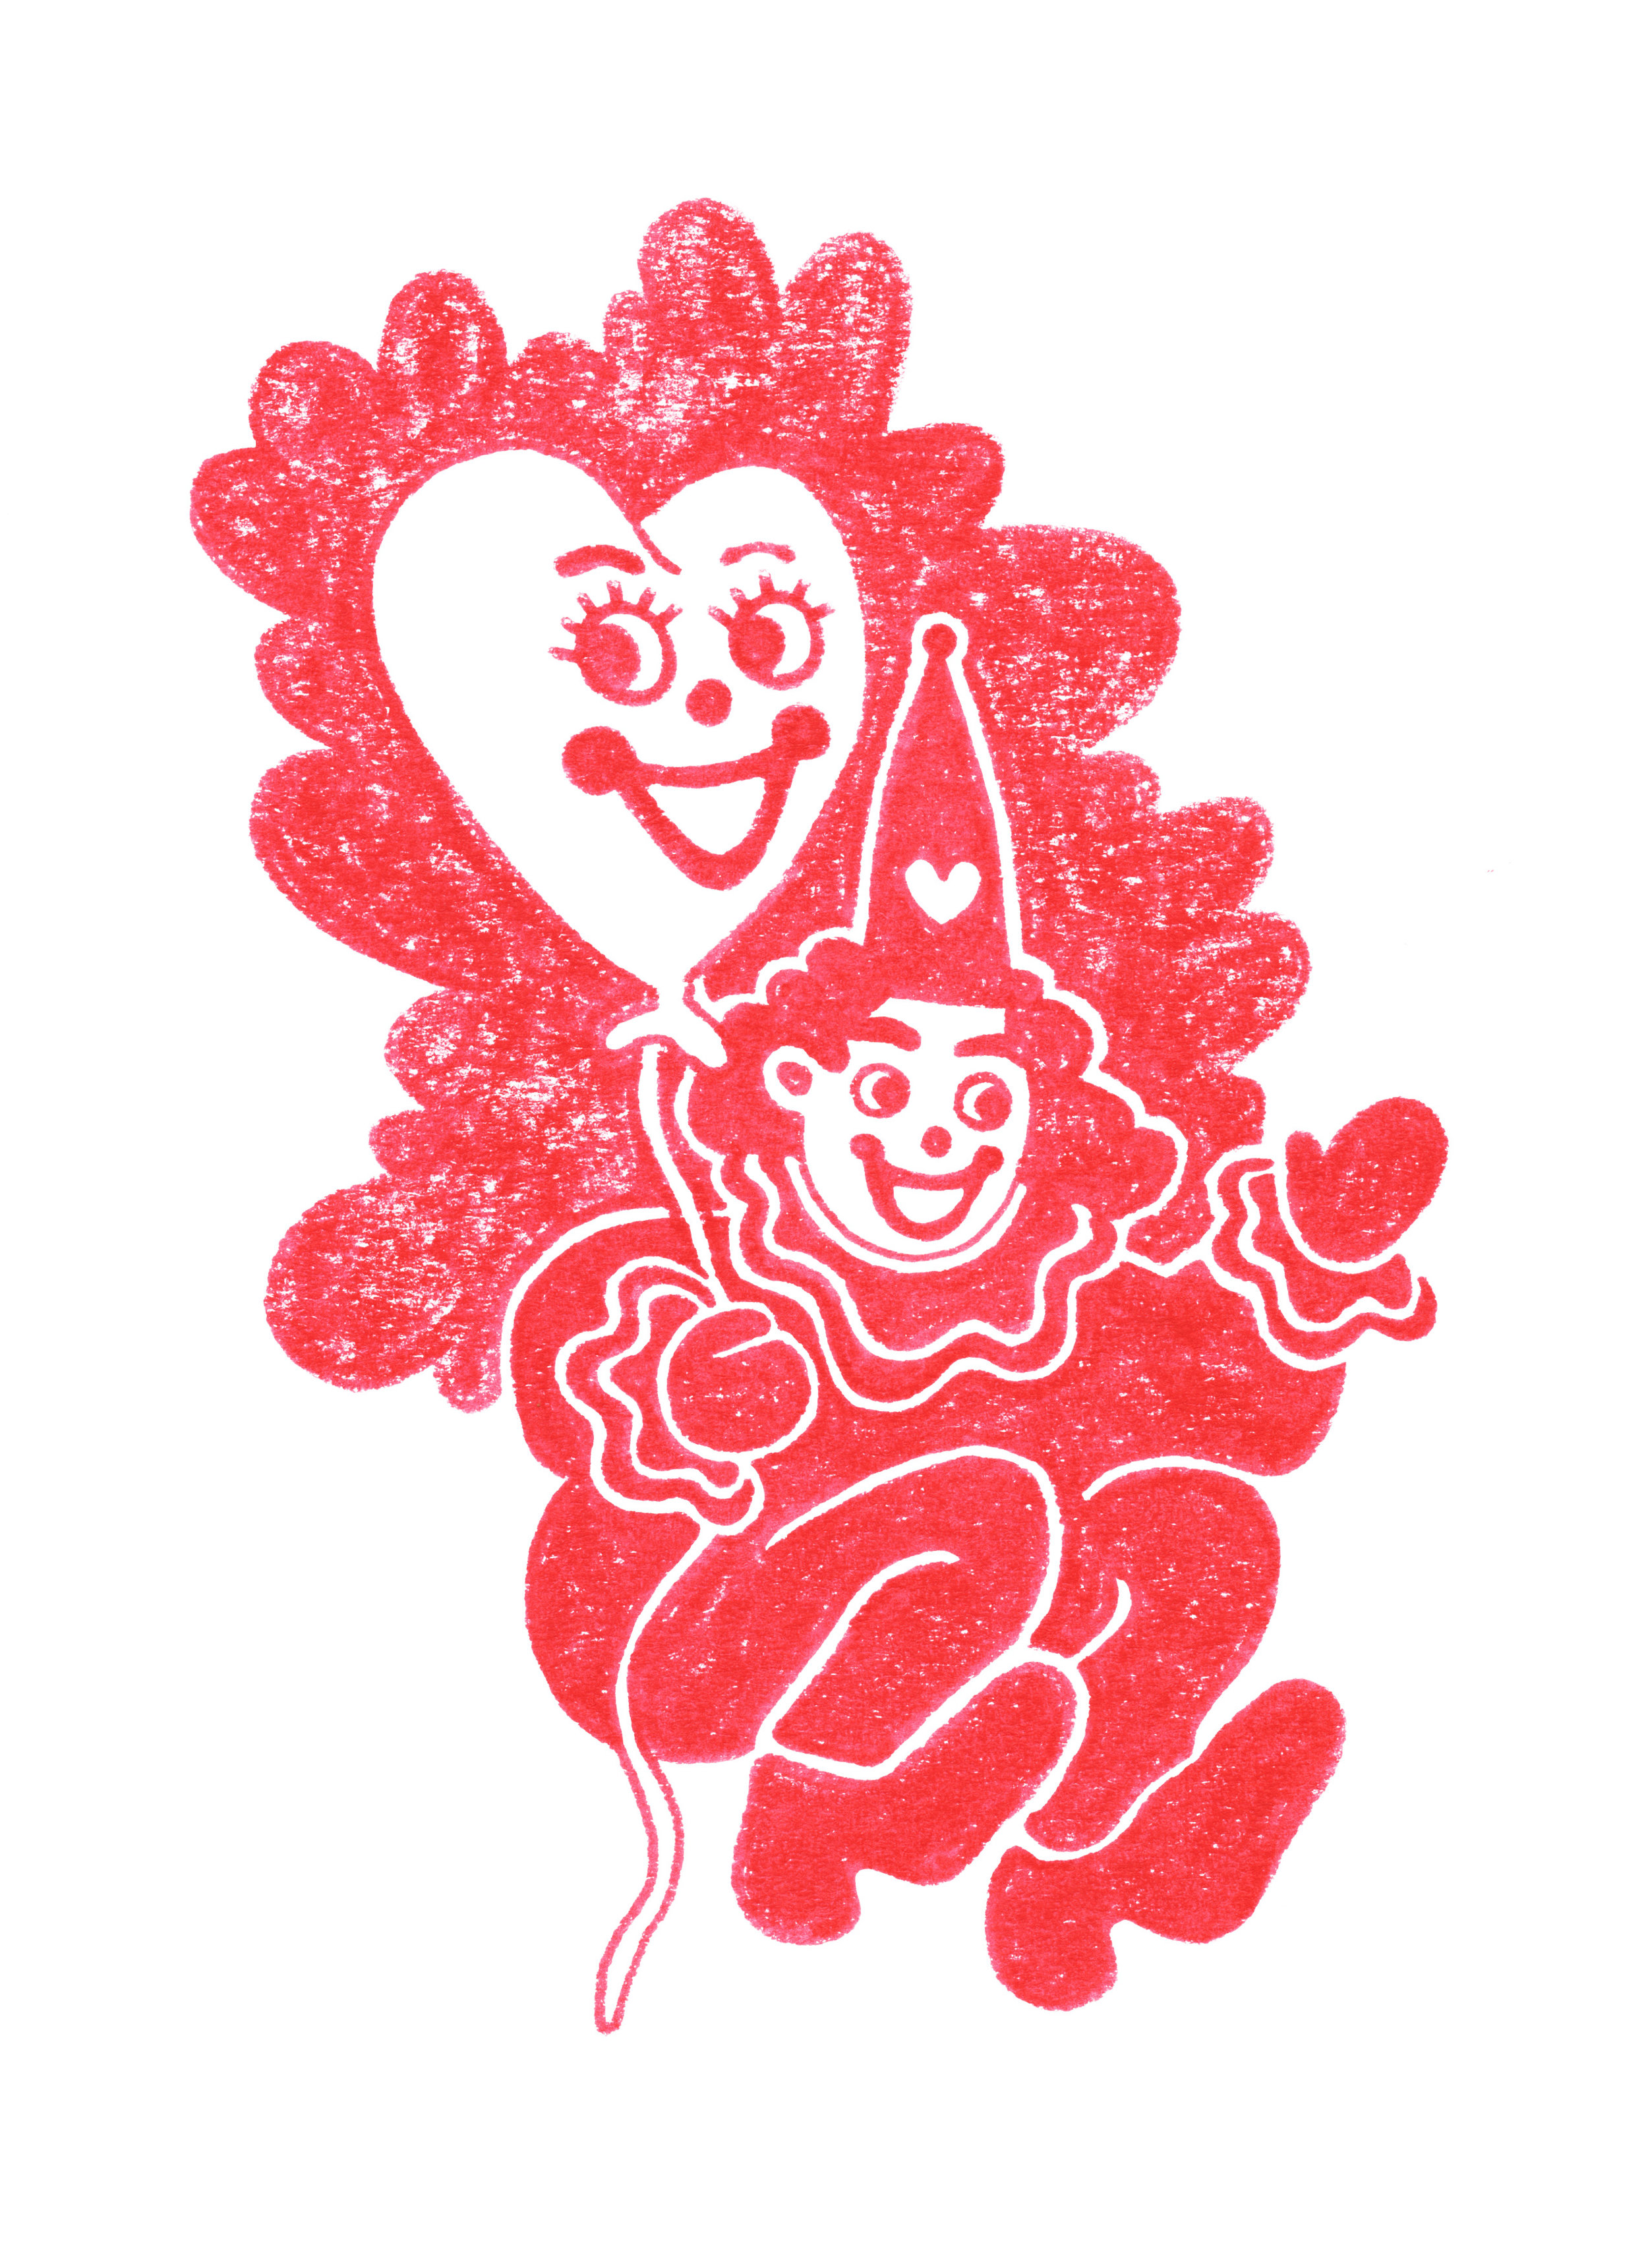 clown_baloon.jpg